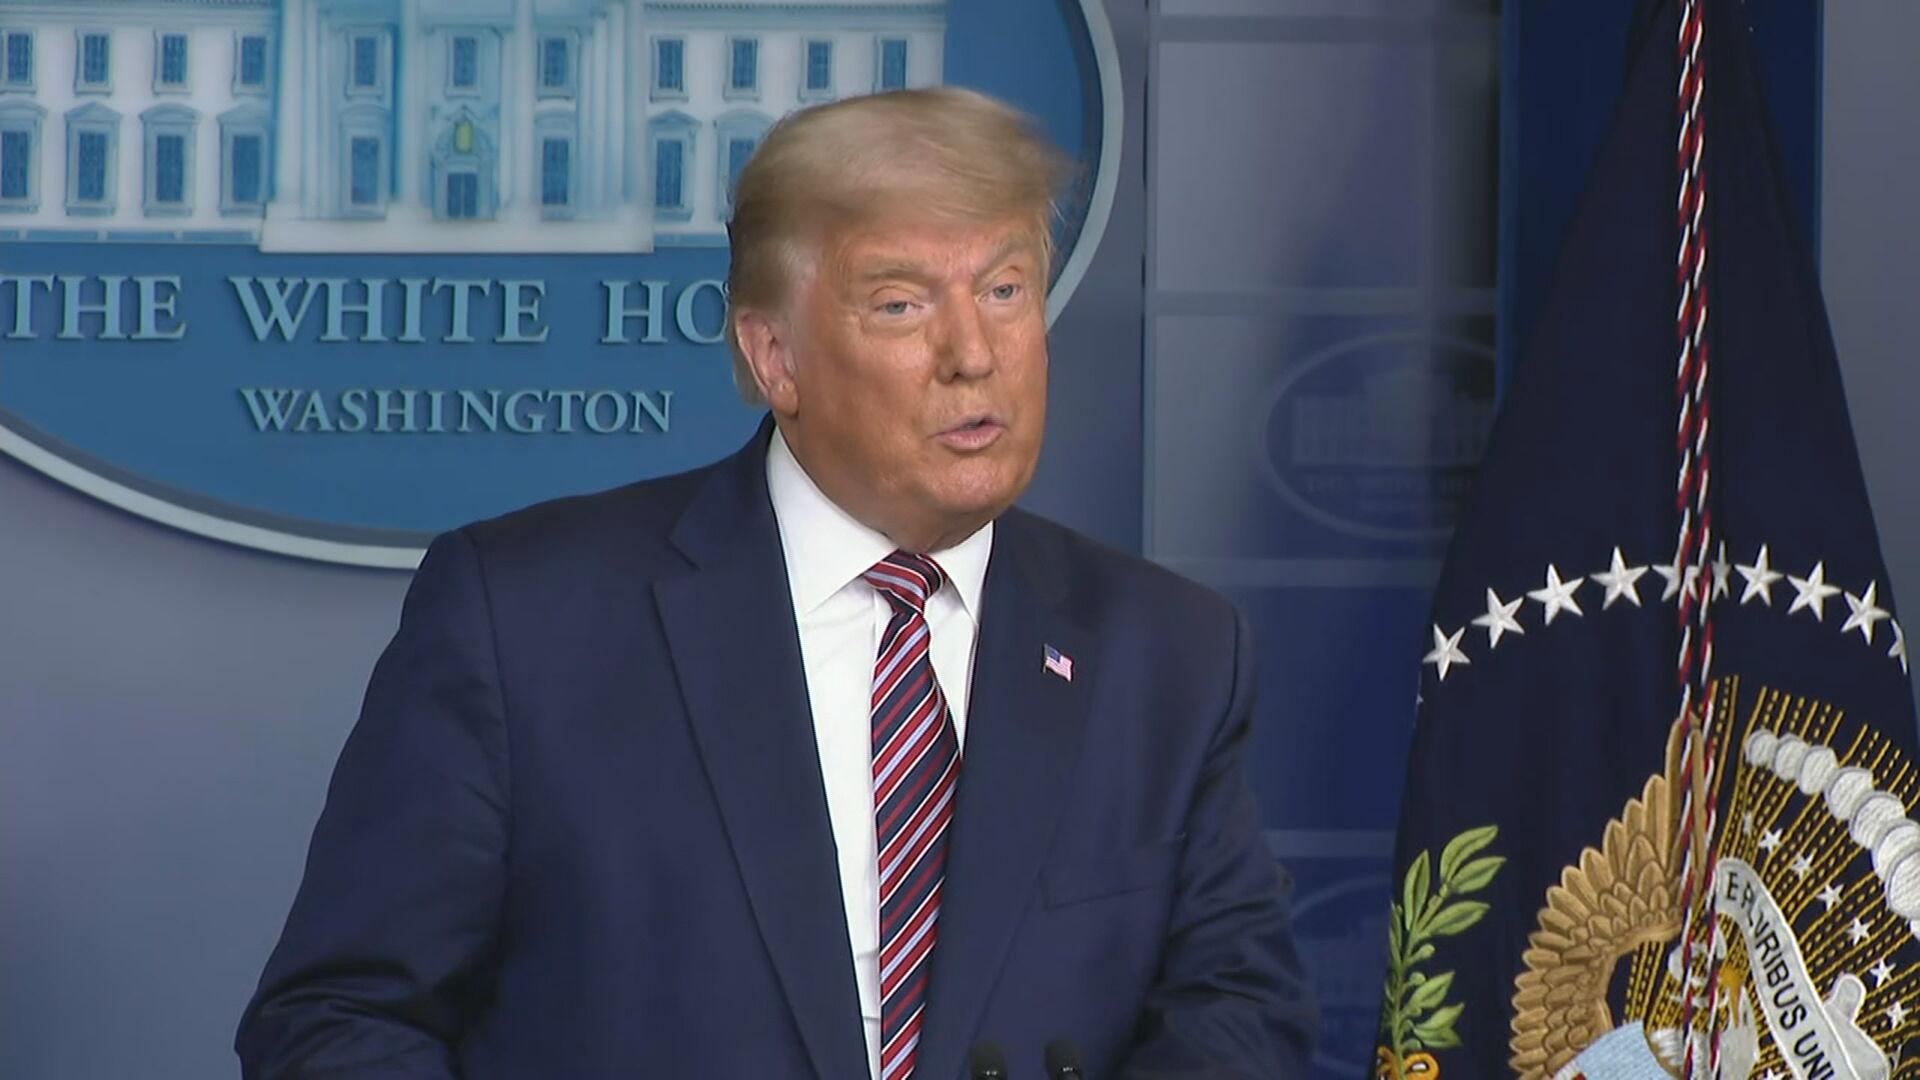 O republicano Donald Trump durante discurso na Casa Branca